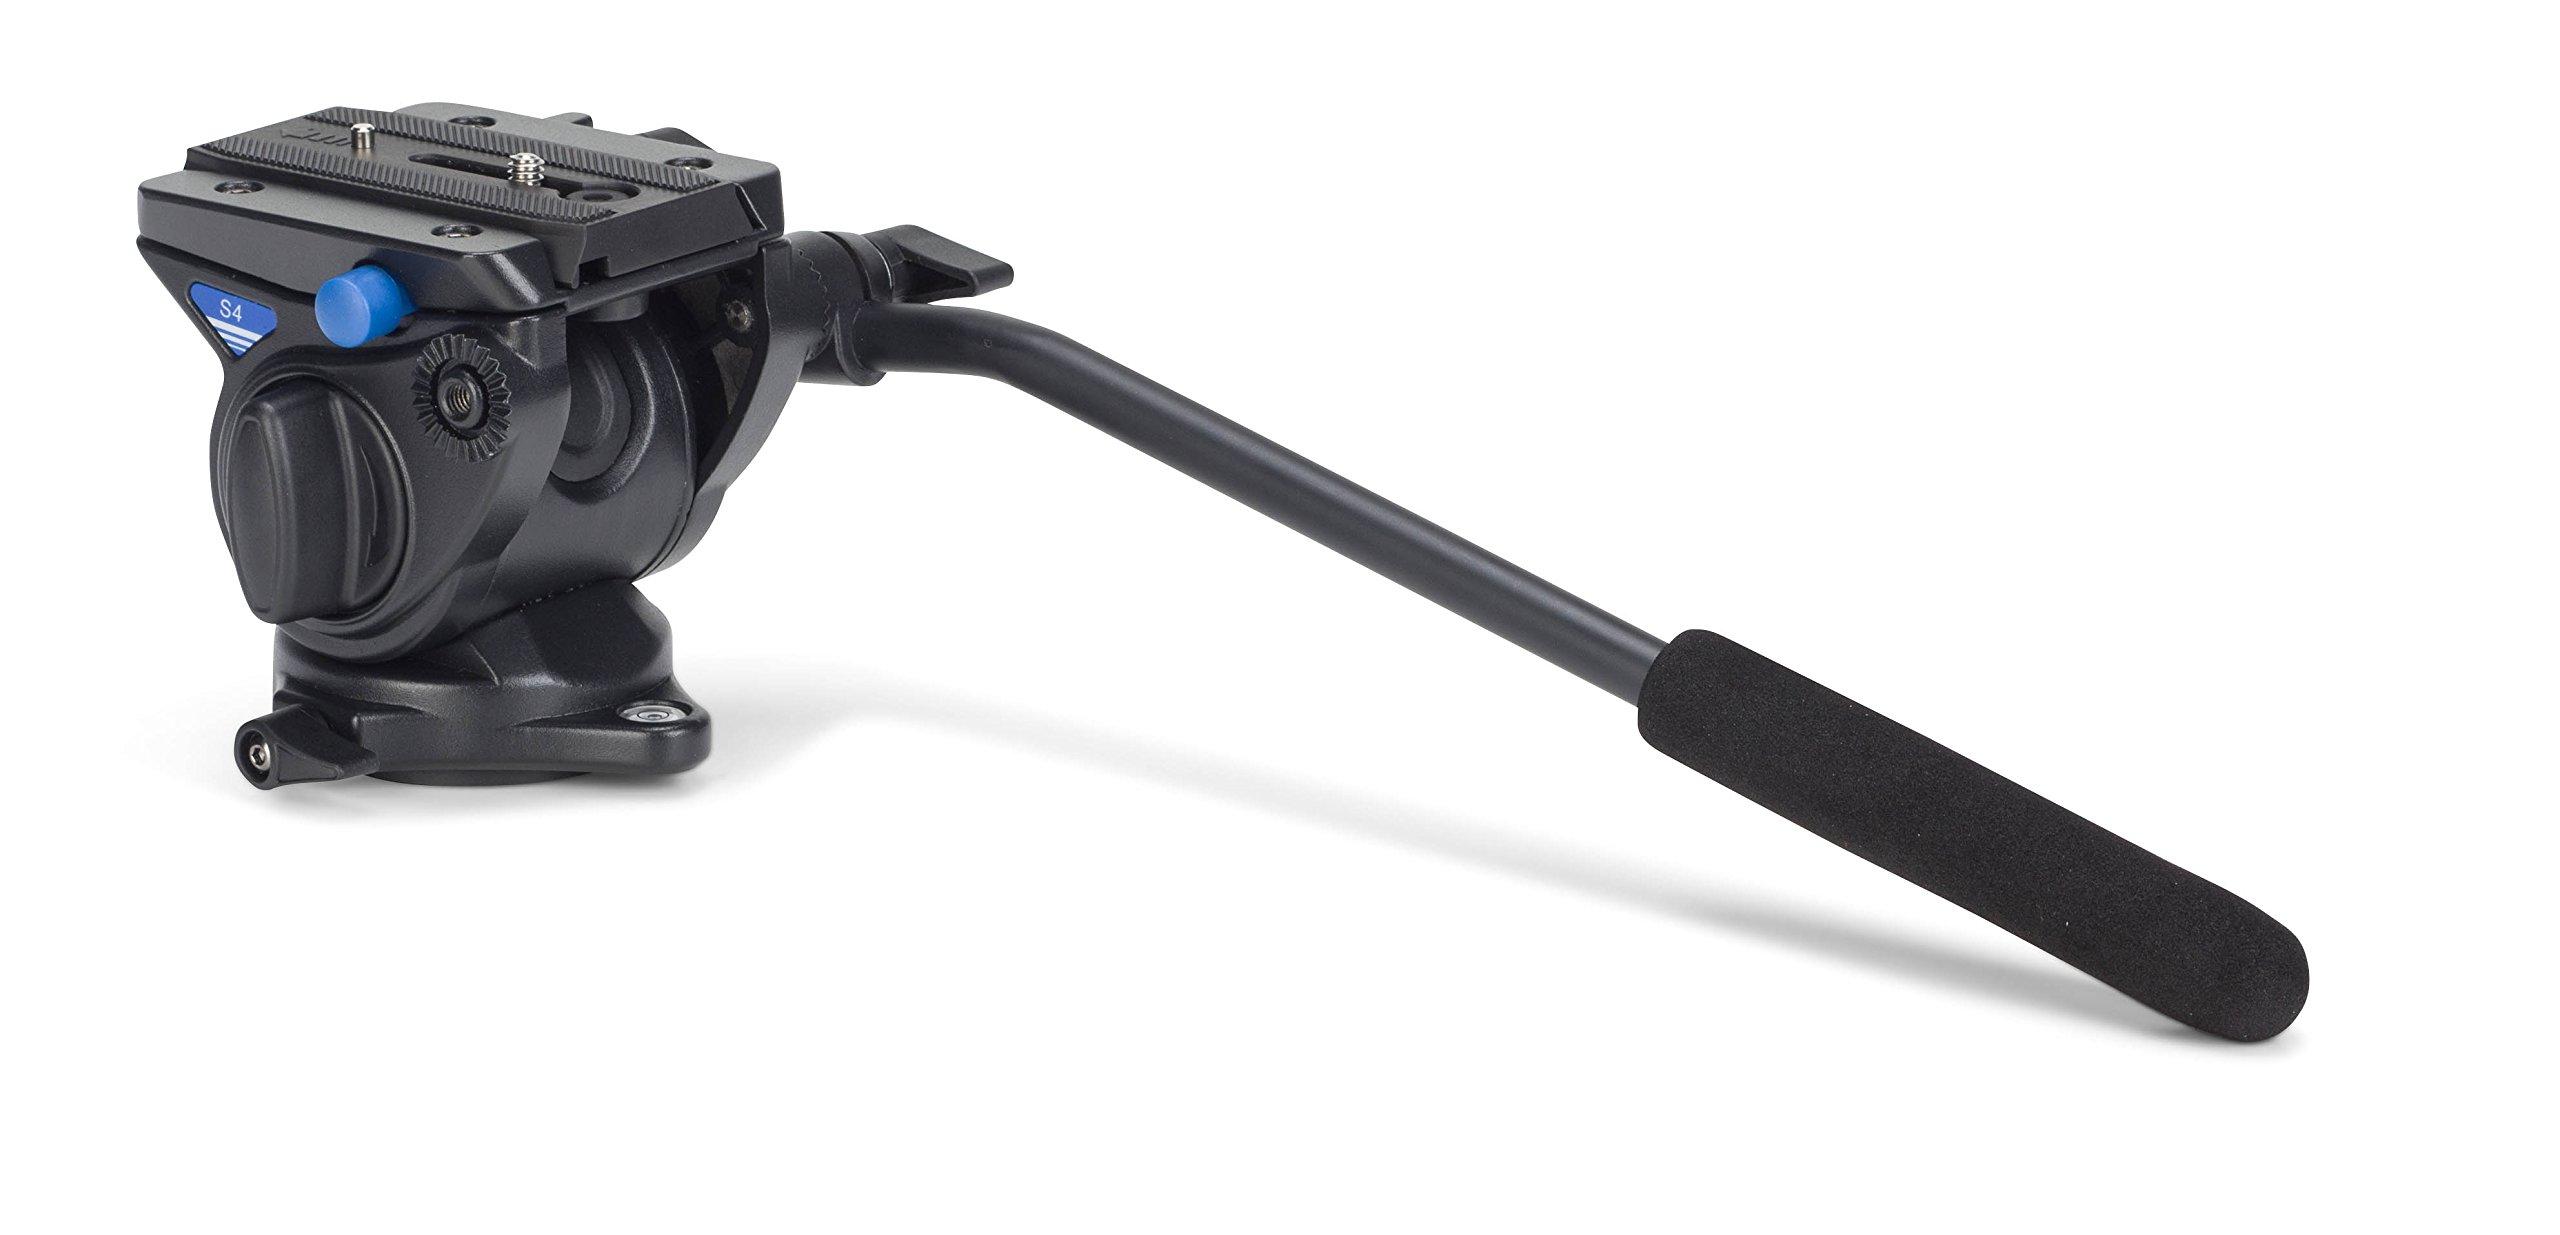 Benro S4 Video Head (Black)